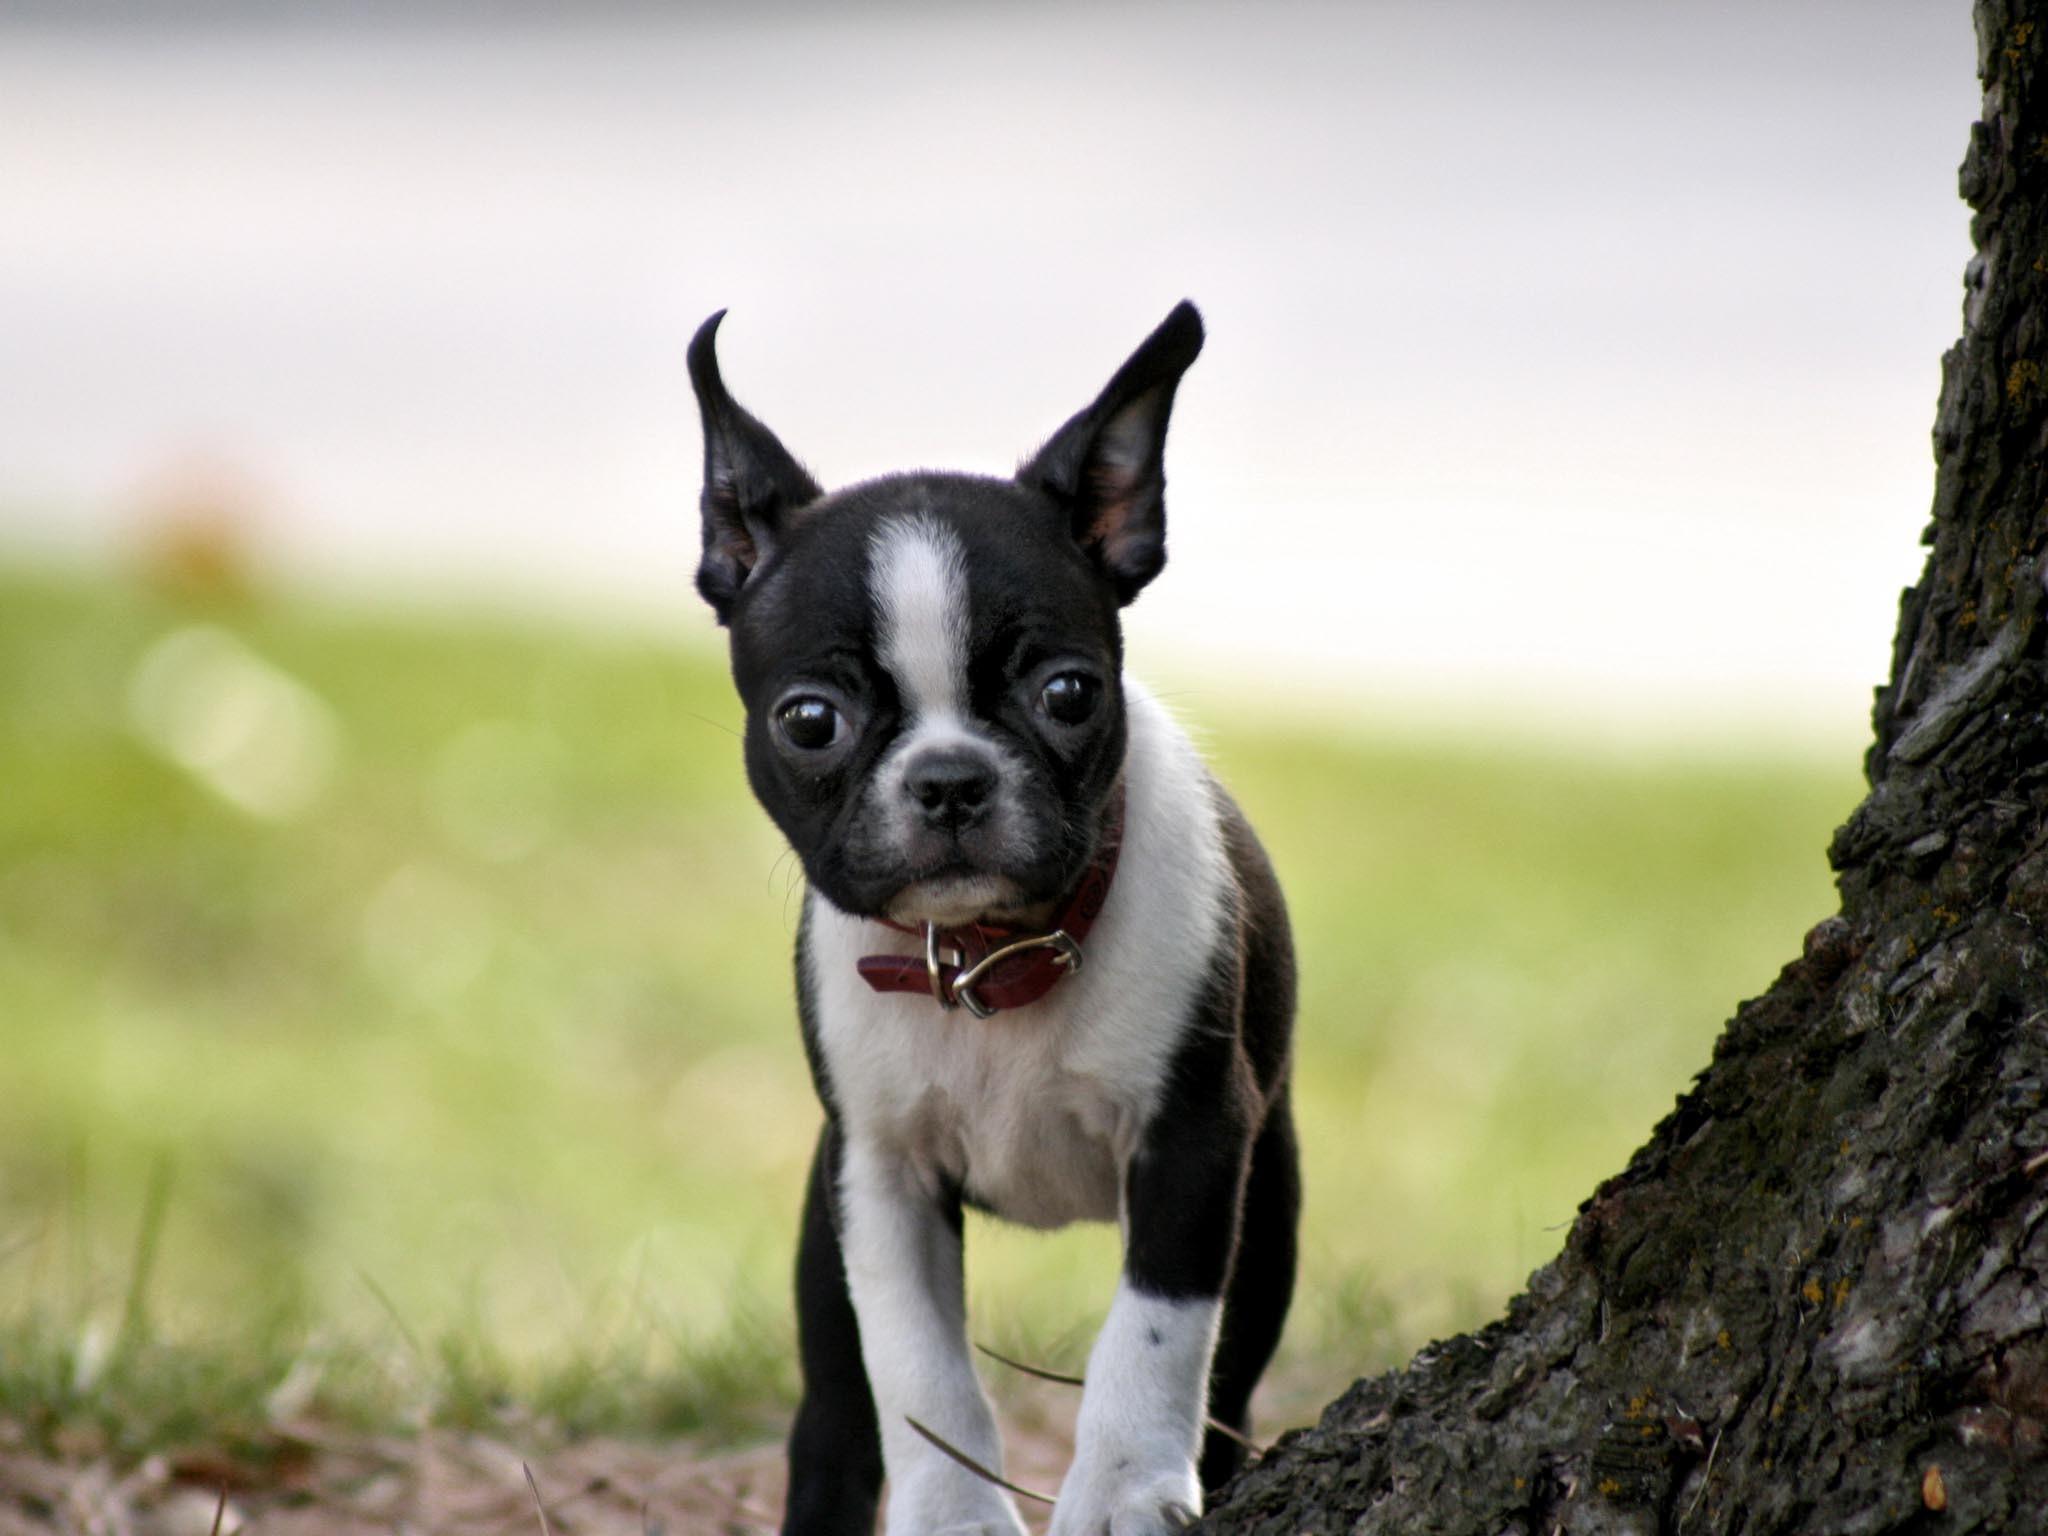 Boston Terrier Puppies – wallpaper.